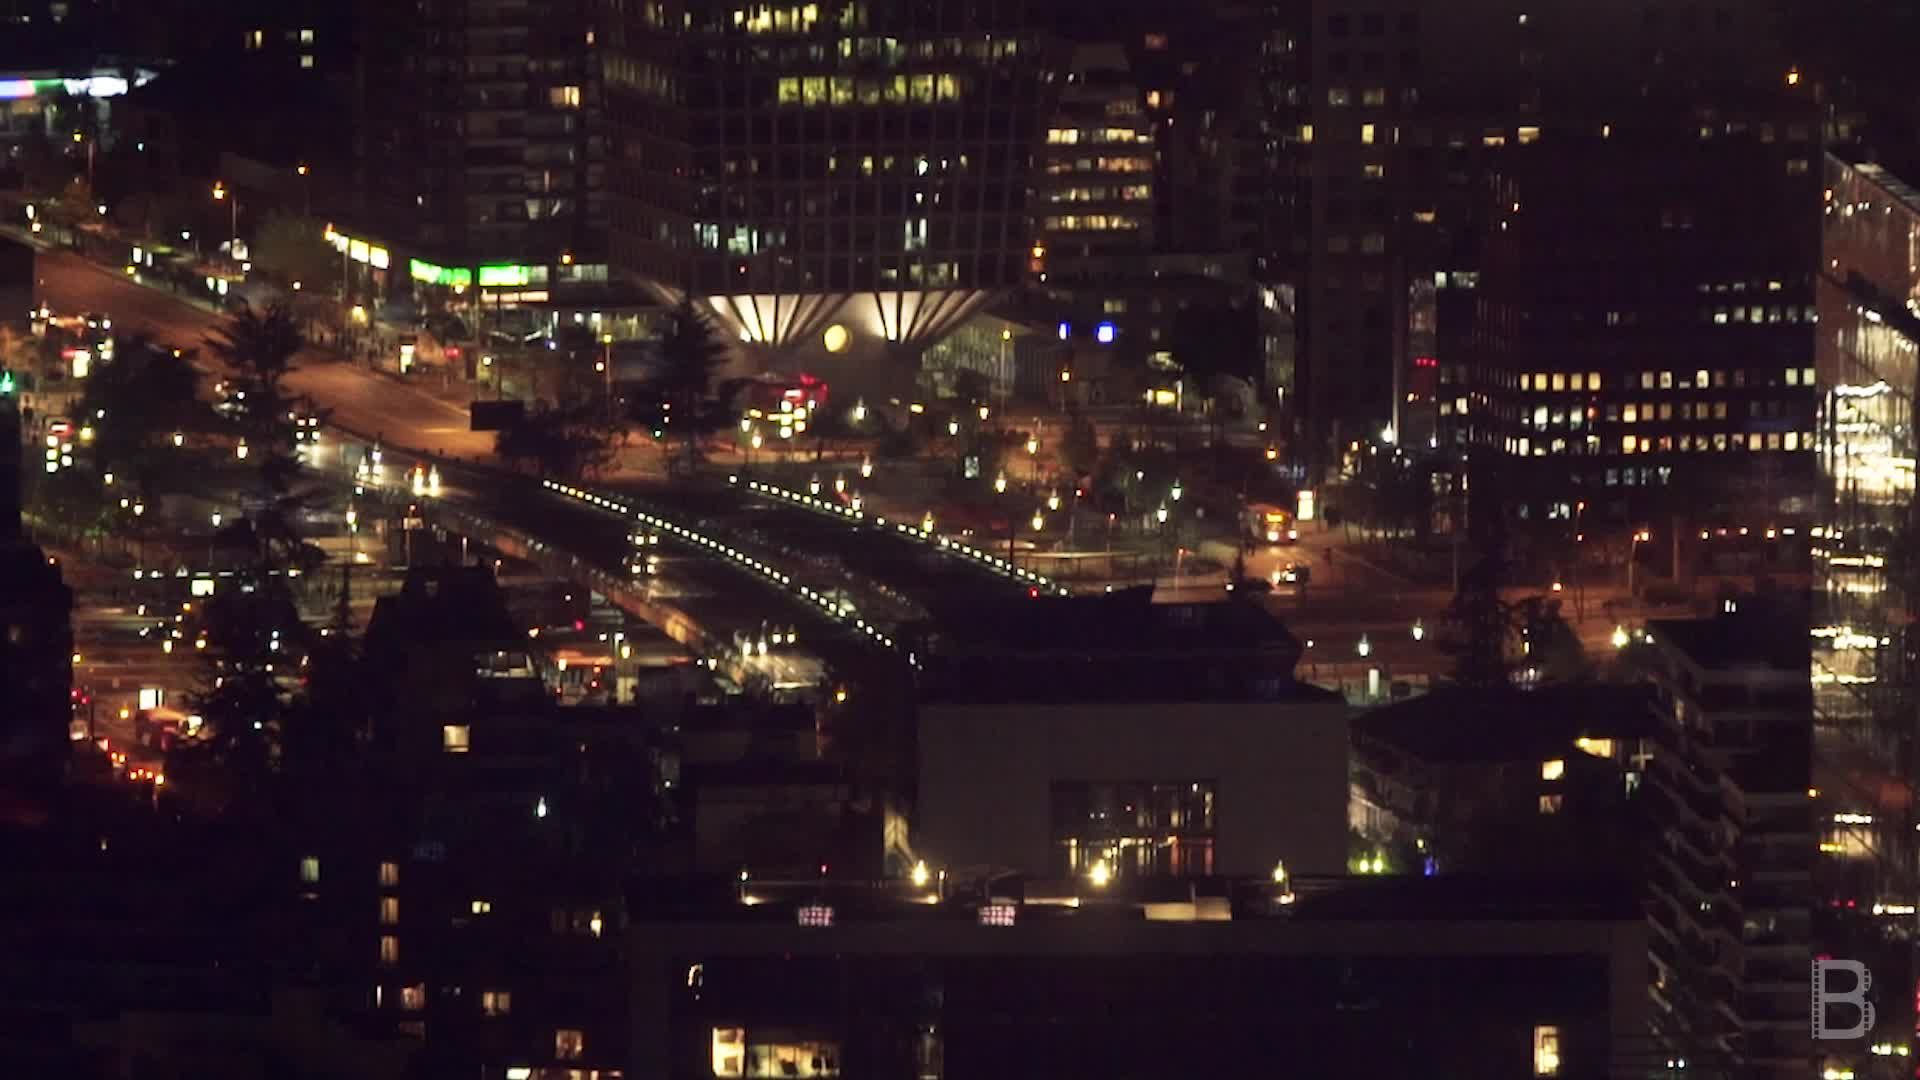 BELLA Presents: daily bello S1 Ep161 Exploring a City at Night